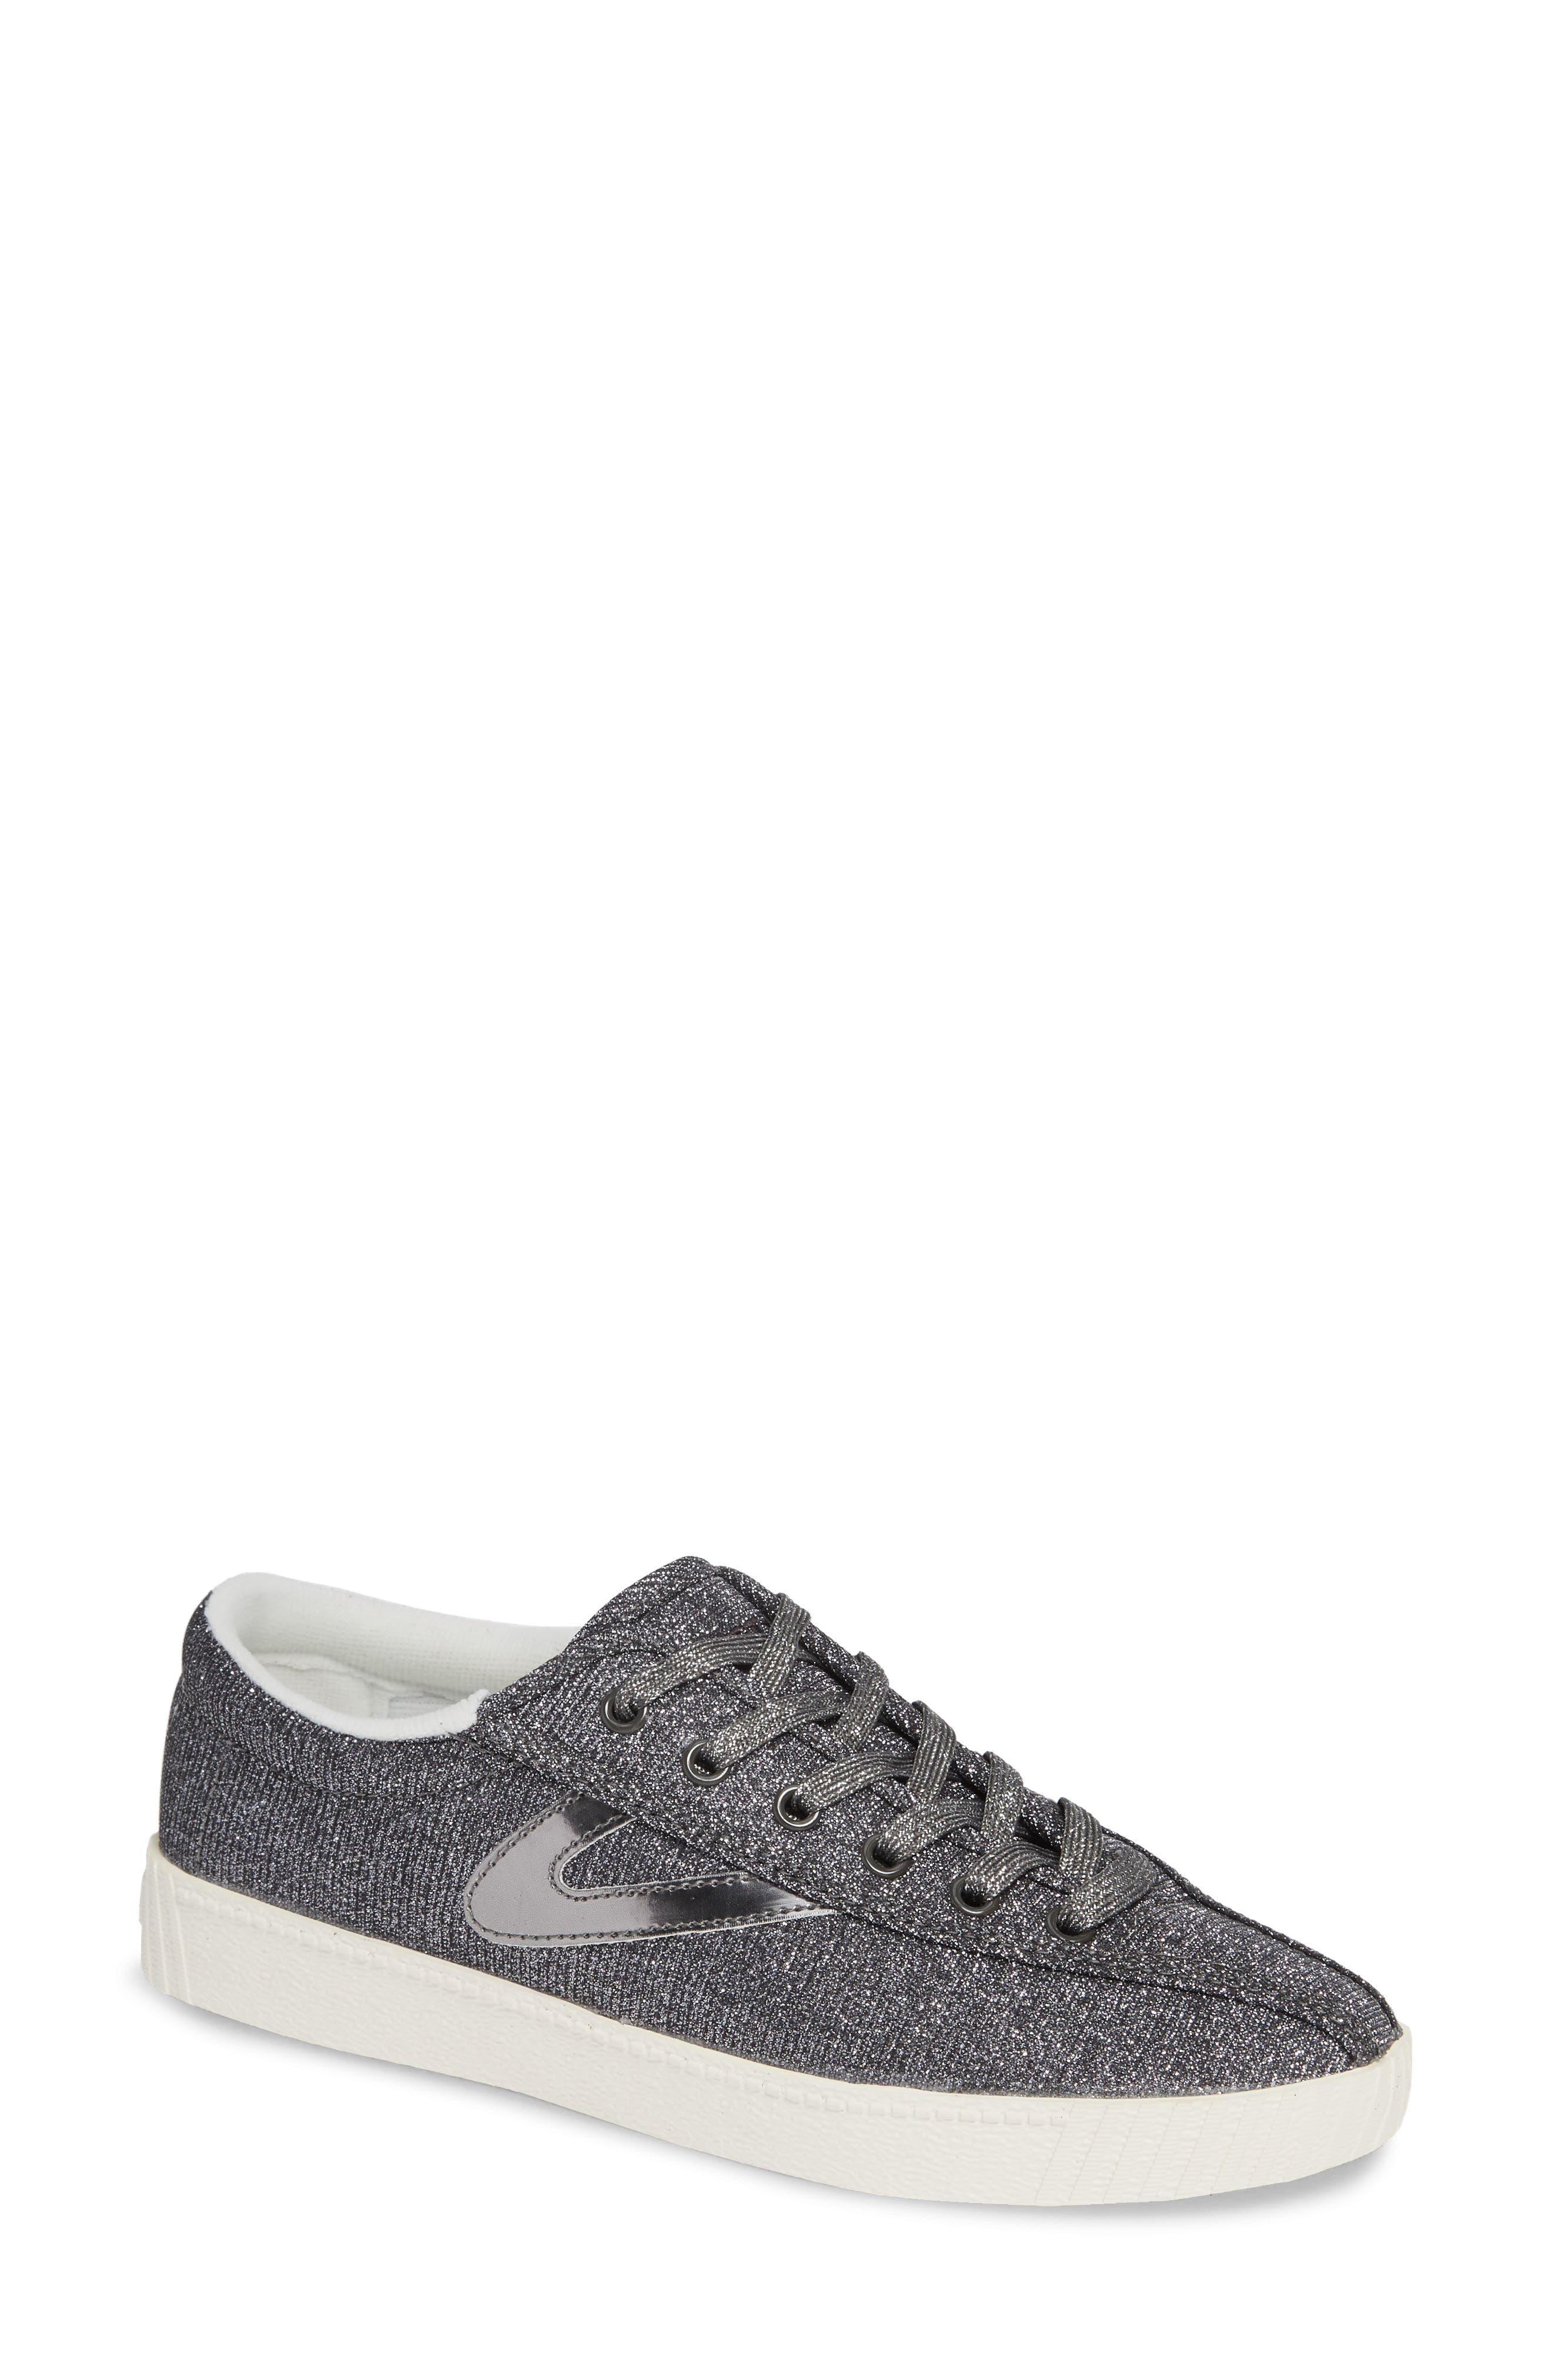 'Nylite' Sneaker, Main, color, 022